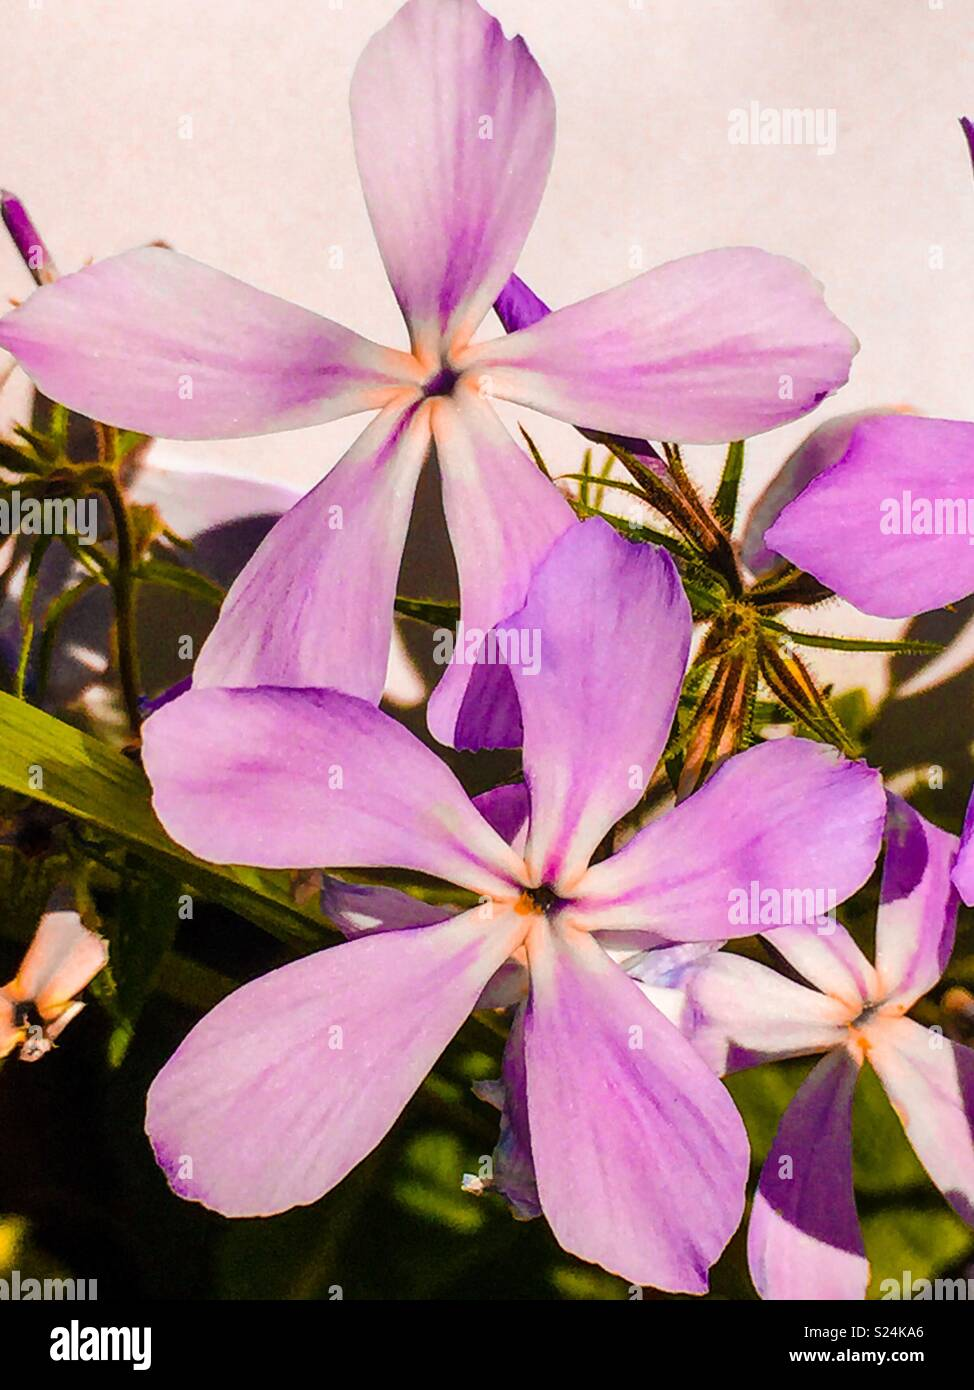 Flower with five petals stock photos flower with five petals stock purple 5 petal flower stock image mightylinksfo